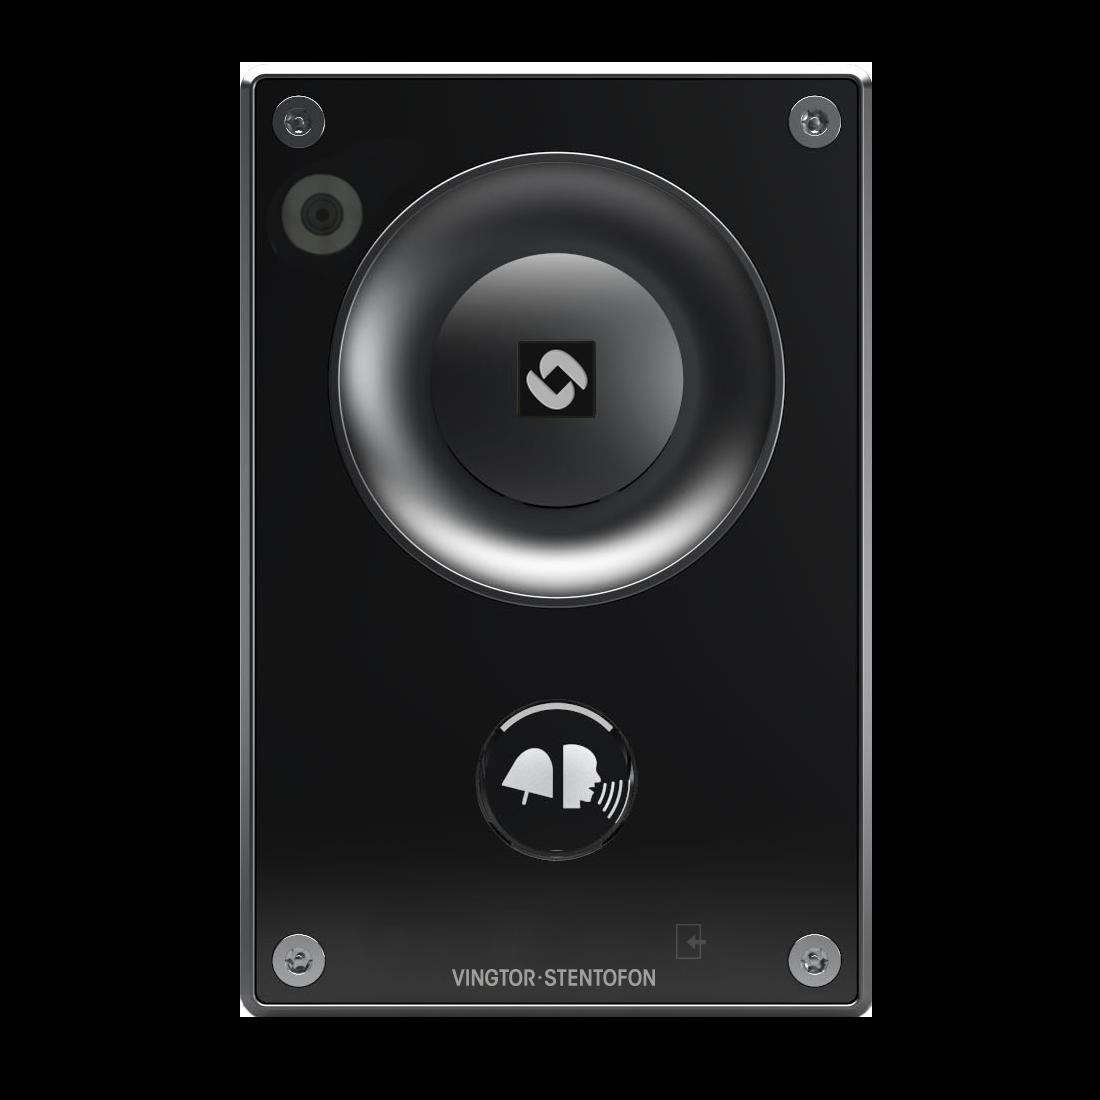 tciv 3 zenitel rh zenitel com  stentofon turbine user manual